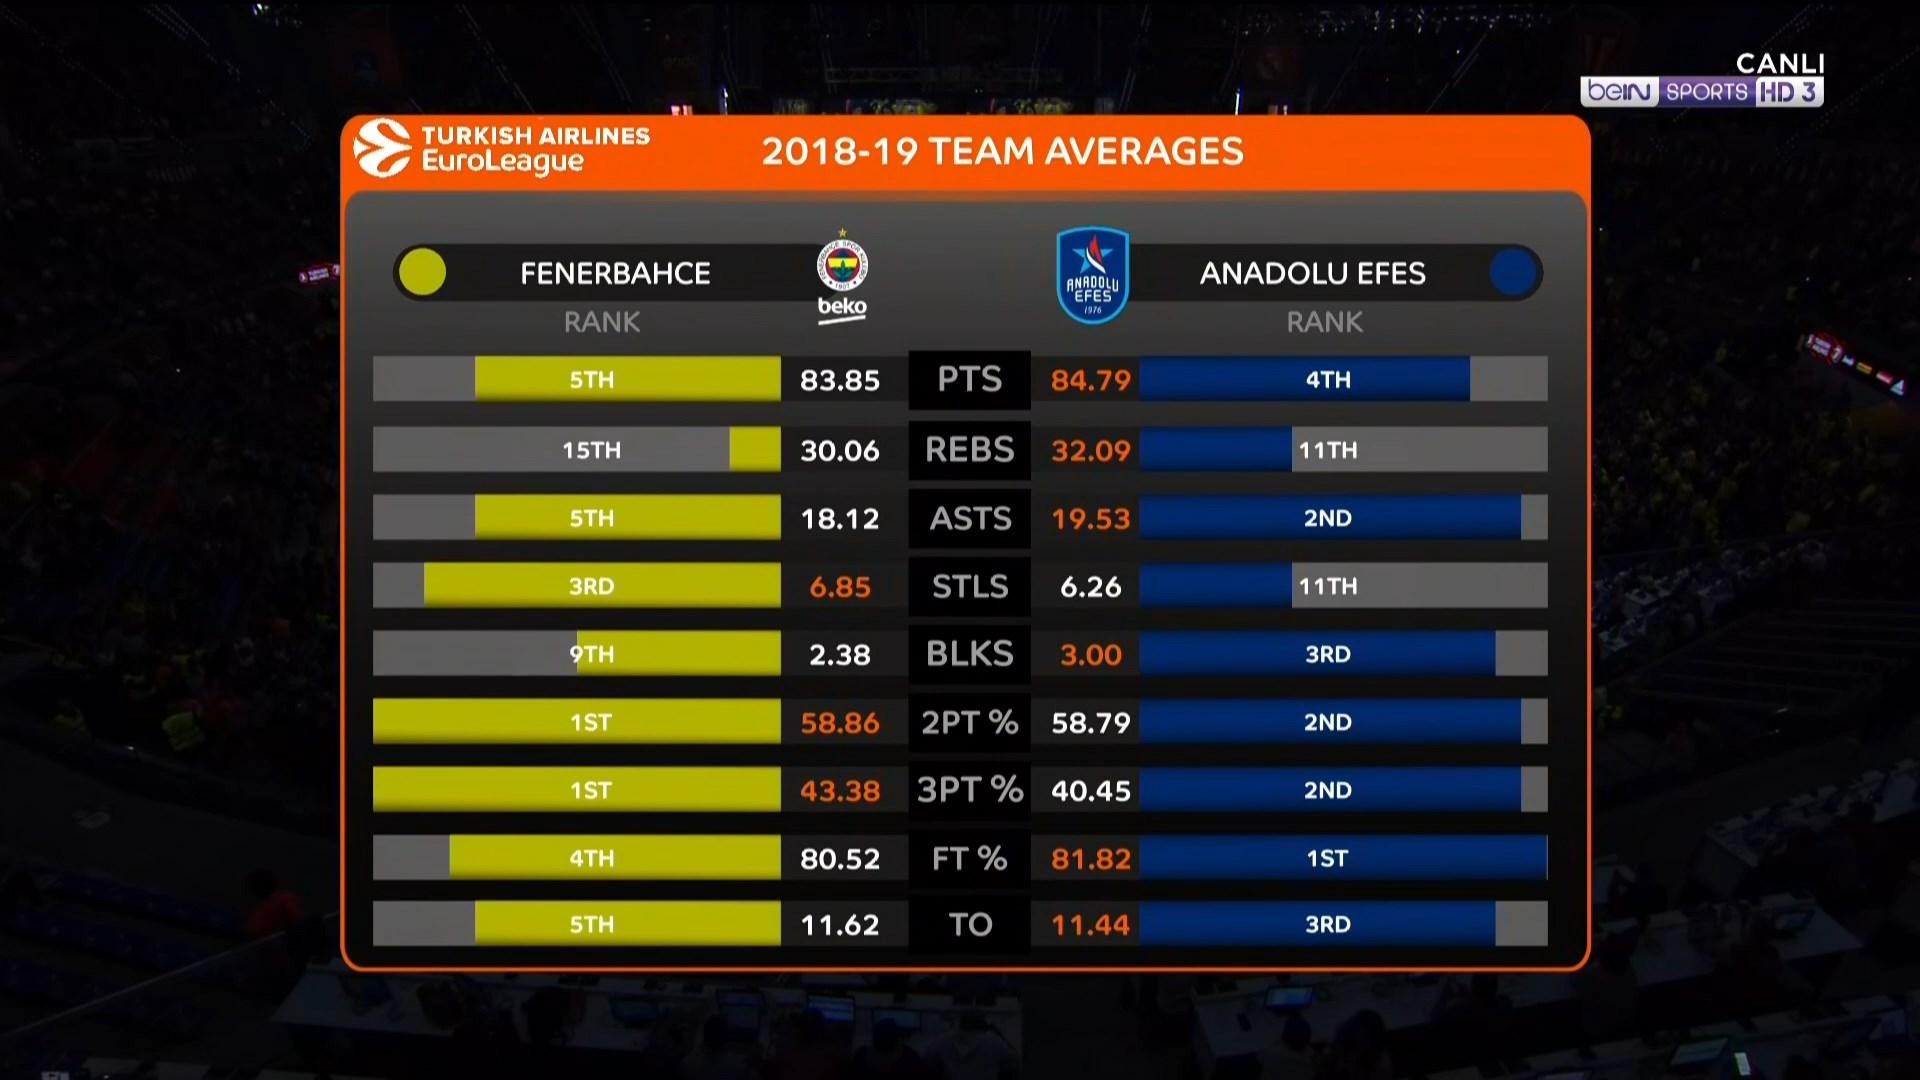 BALONCESTO: Final Four 2019 - SF 1° - Fenerbahçe vs Anadolu Efes